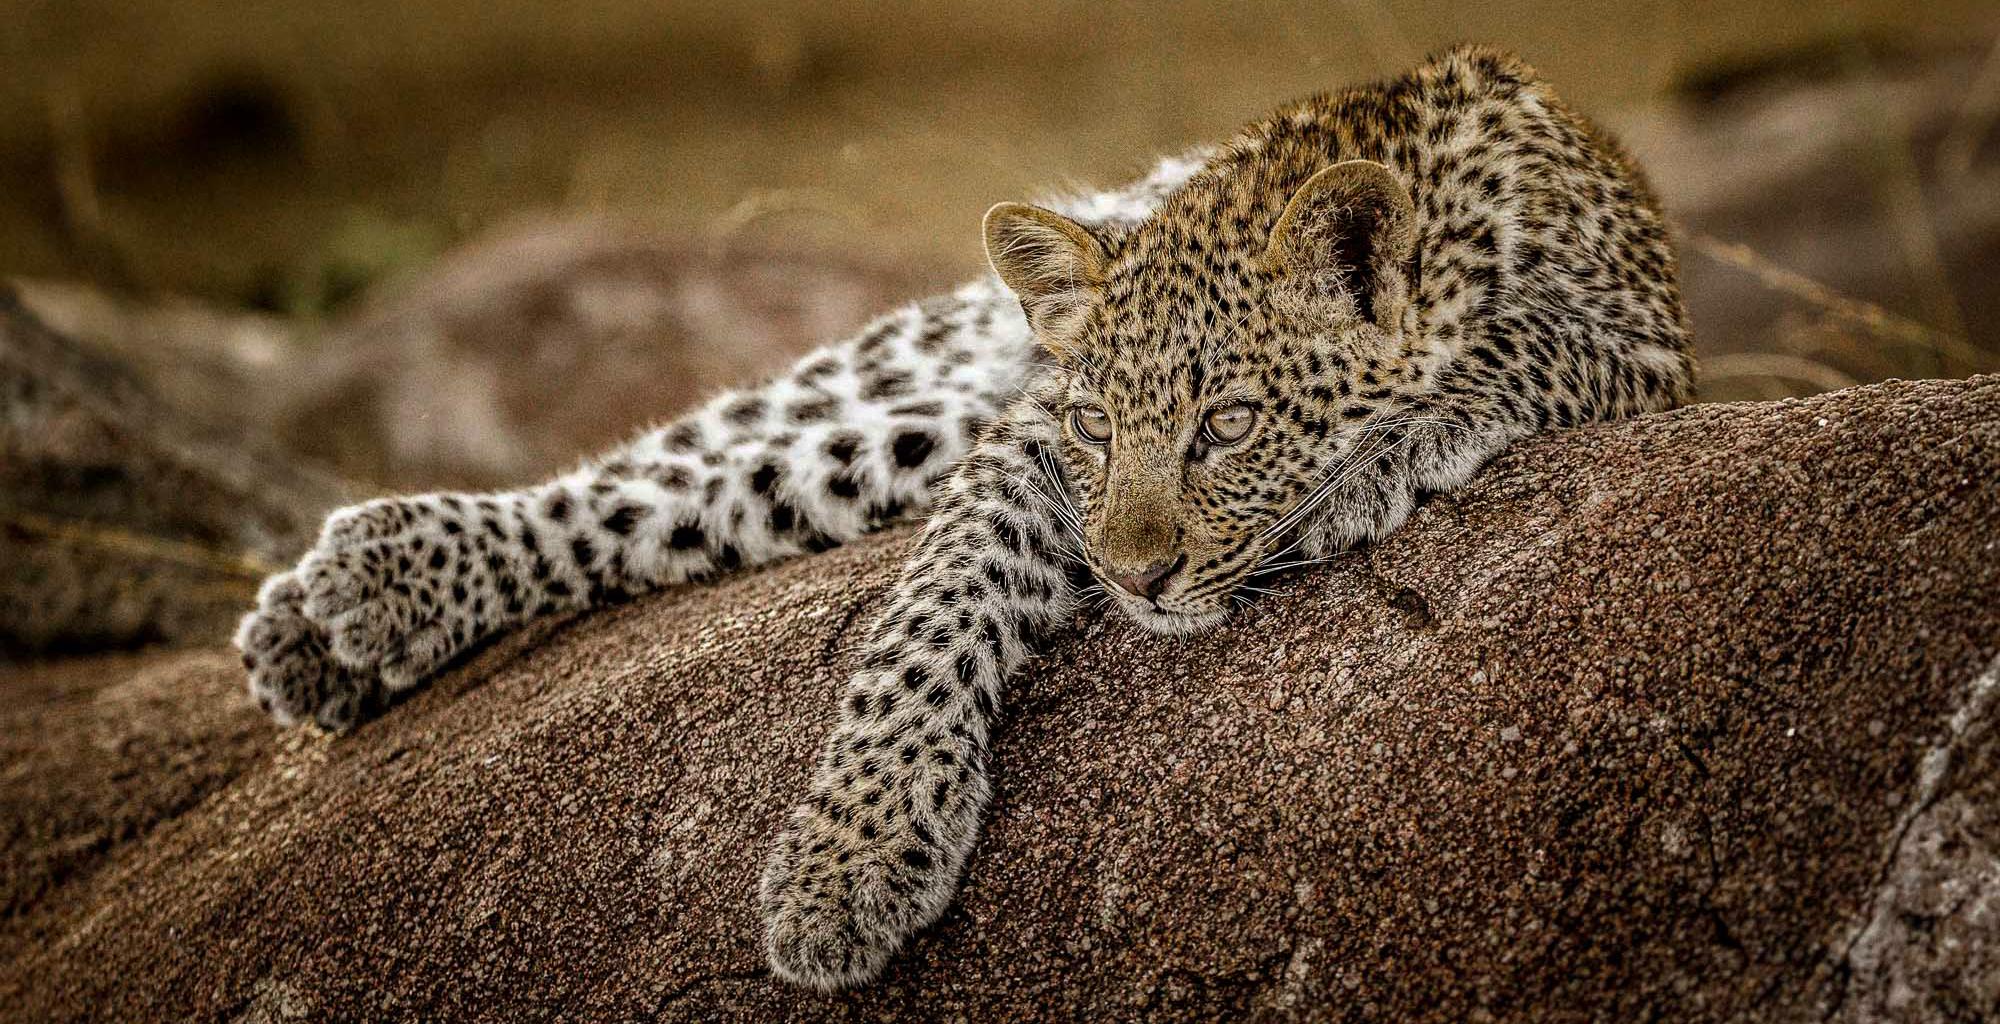 Tanzania-Legendary-Serengeti-Camp-Leopard